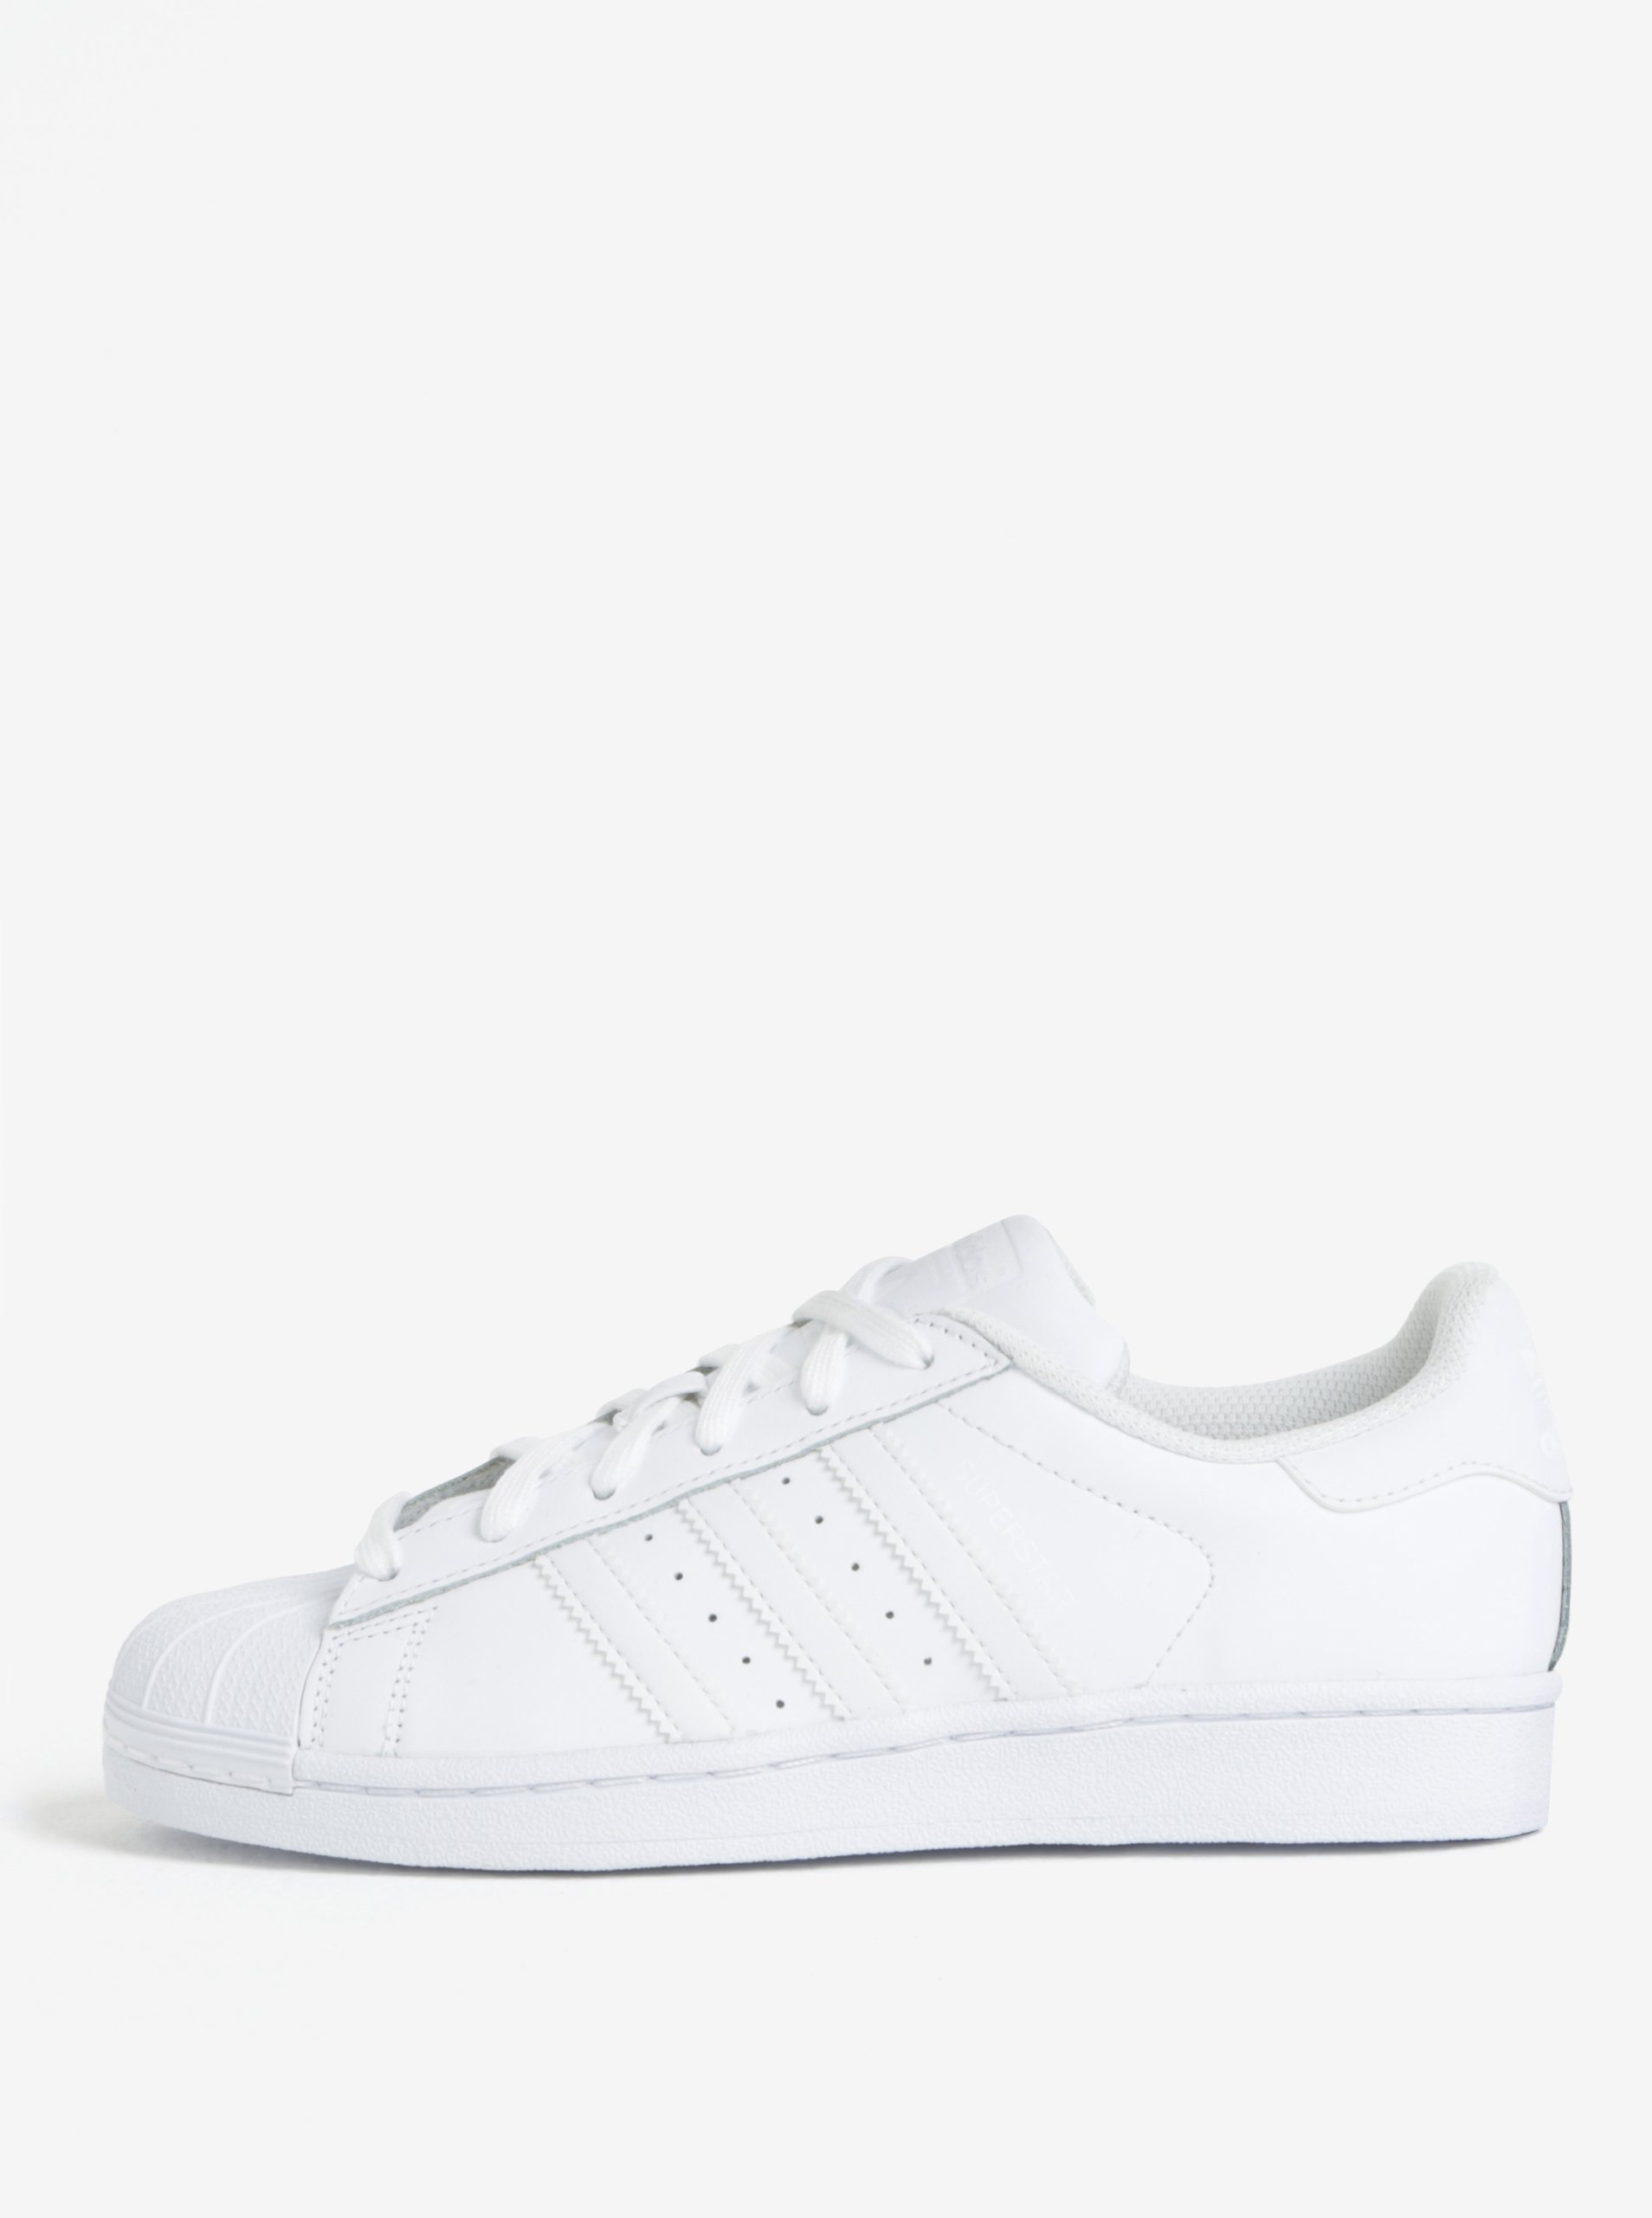 Biele tenisky adidas Originals Superstar 48c521cfe5b